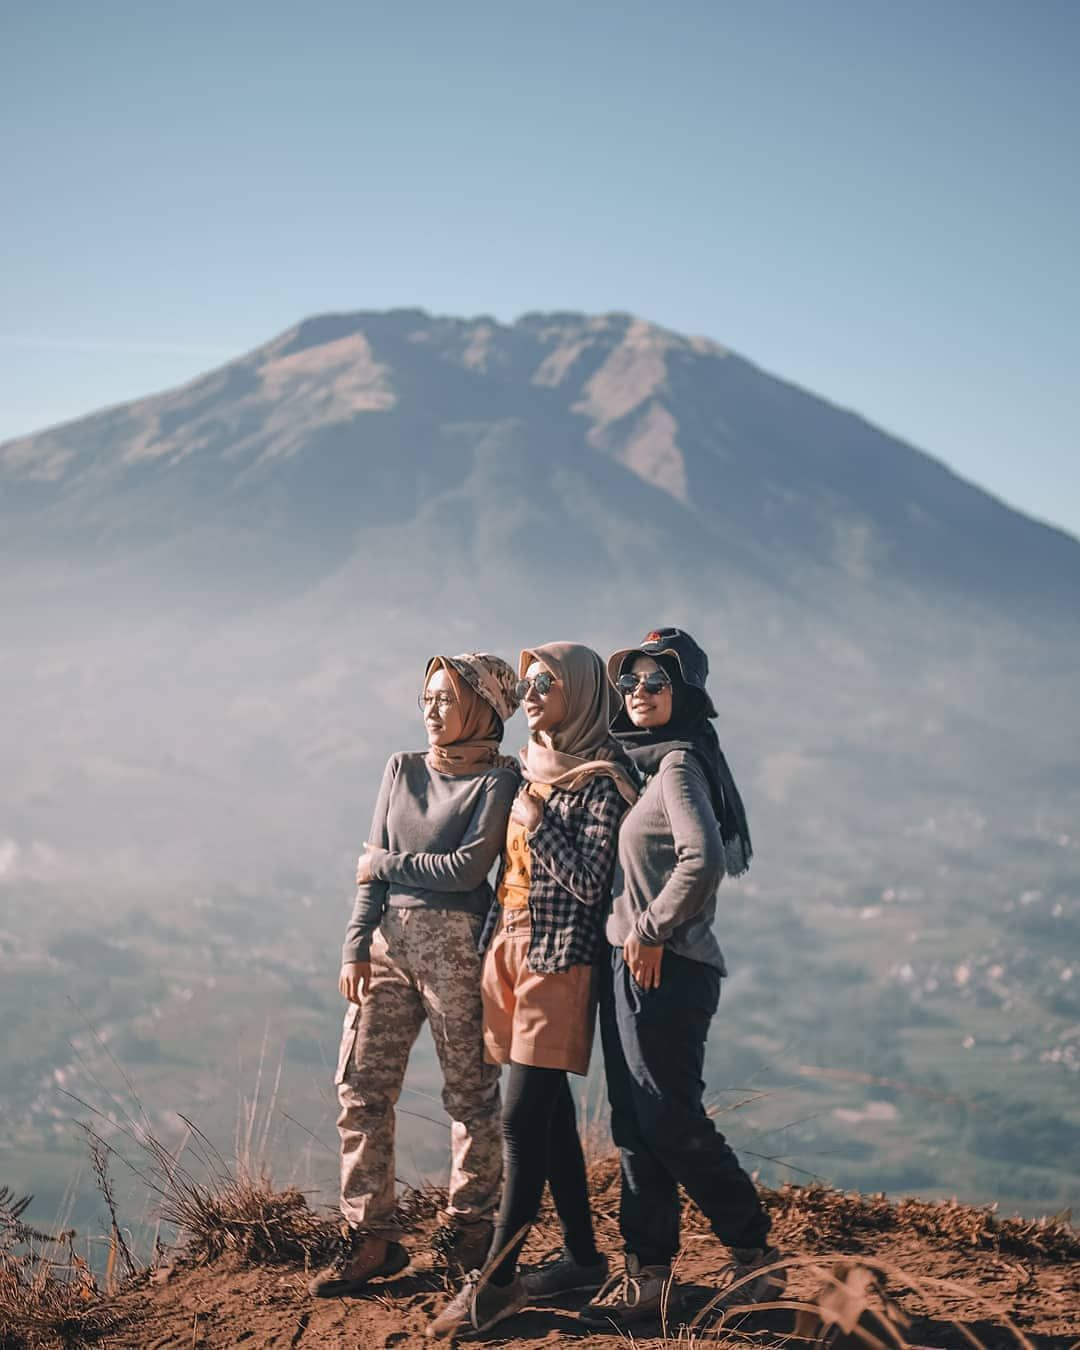 N E G R I P E N D A K I S Instagram Post Satu Dua Tiga Kucing Berlari Perempuan Seperti Apa Yg K In 2020 Muslimah Fashion Casual Hiking Outfit Hijab Style Casual